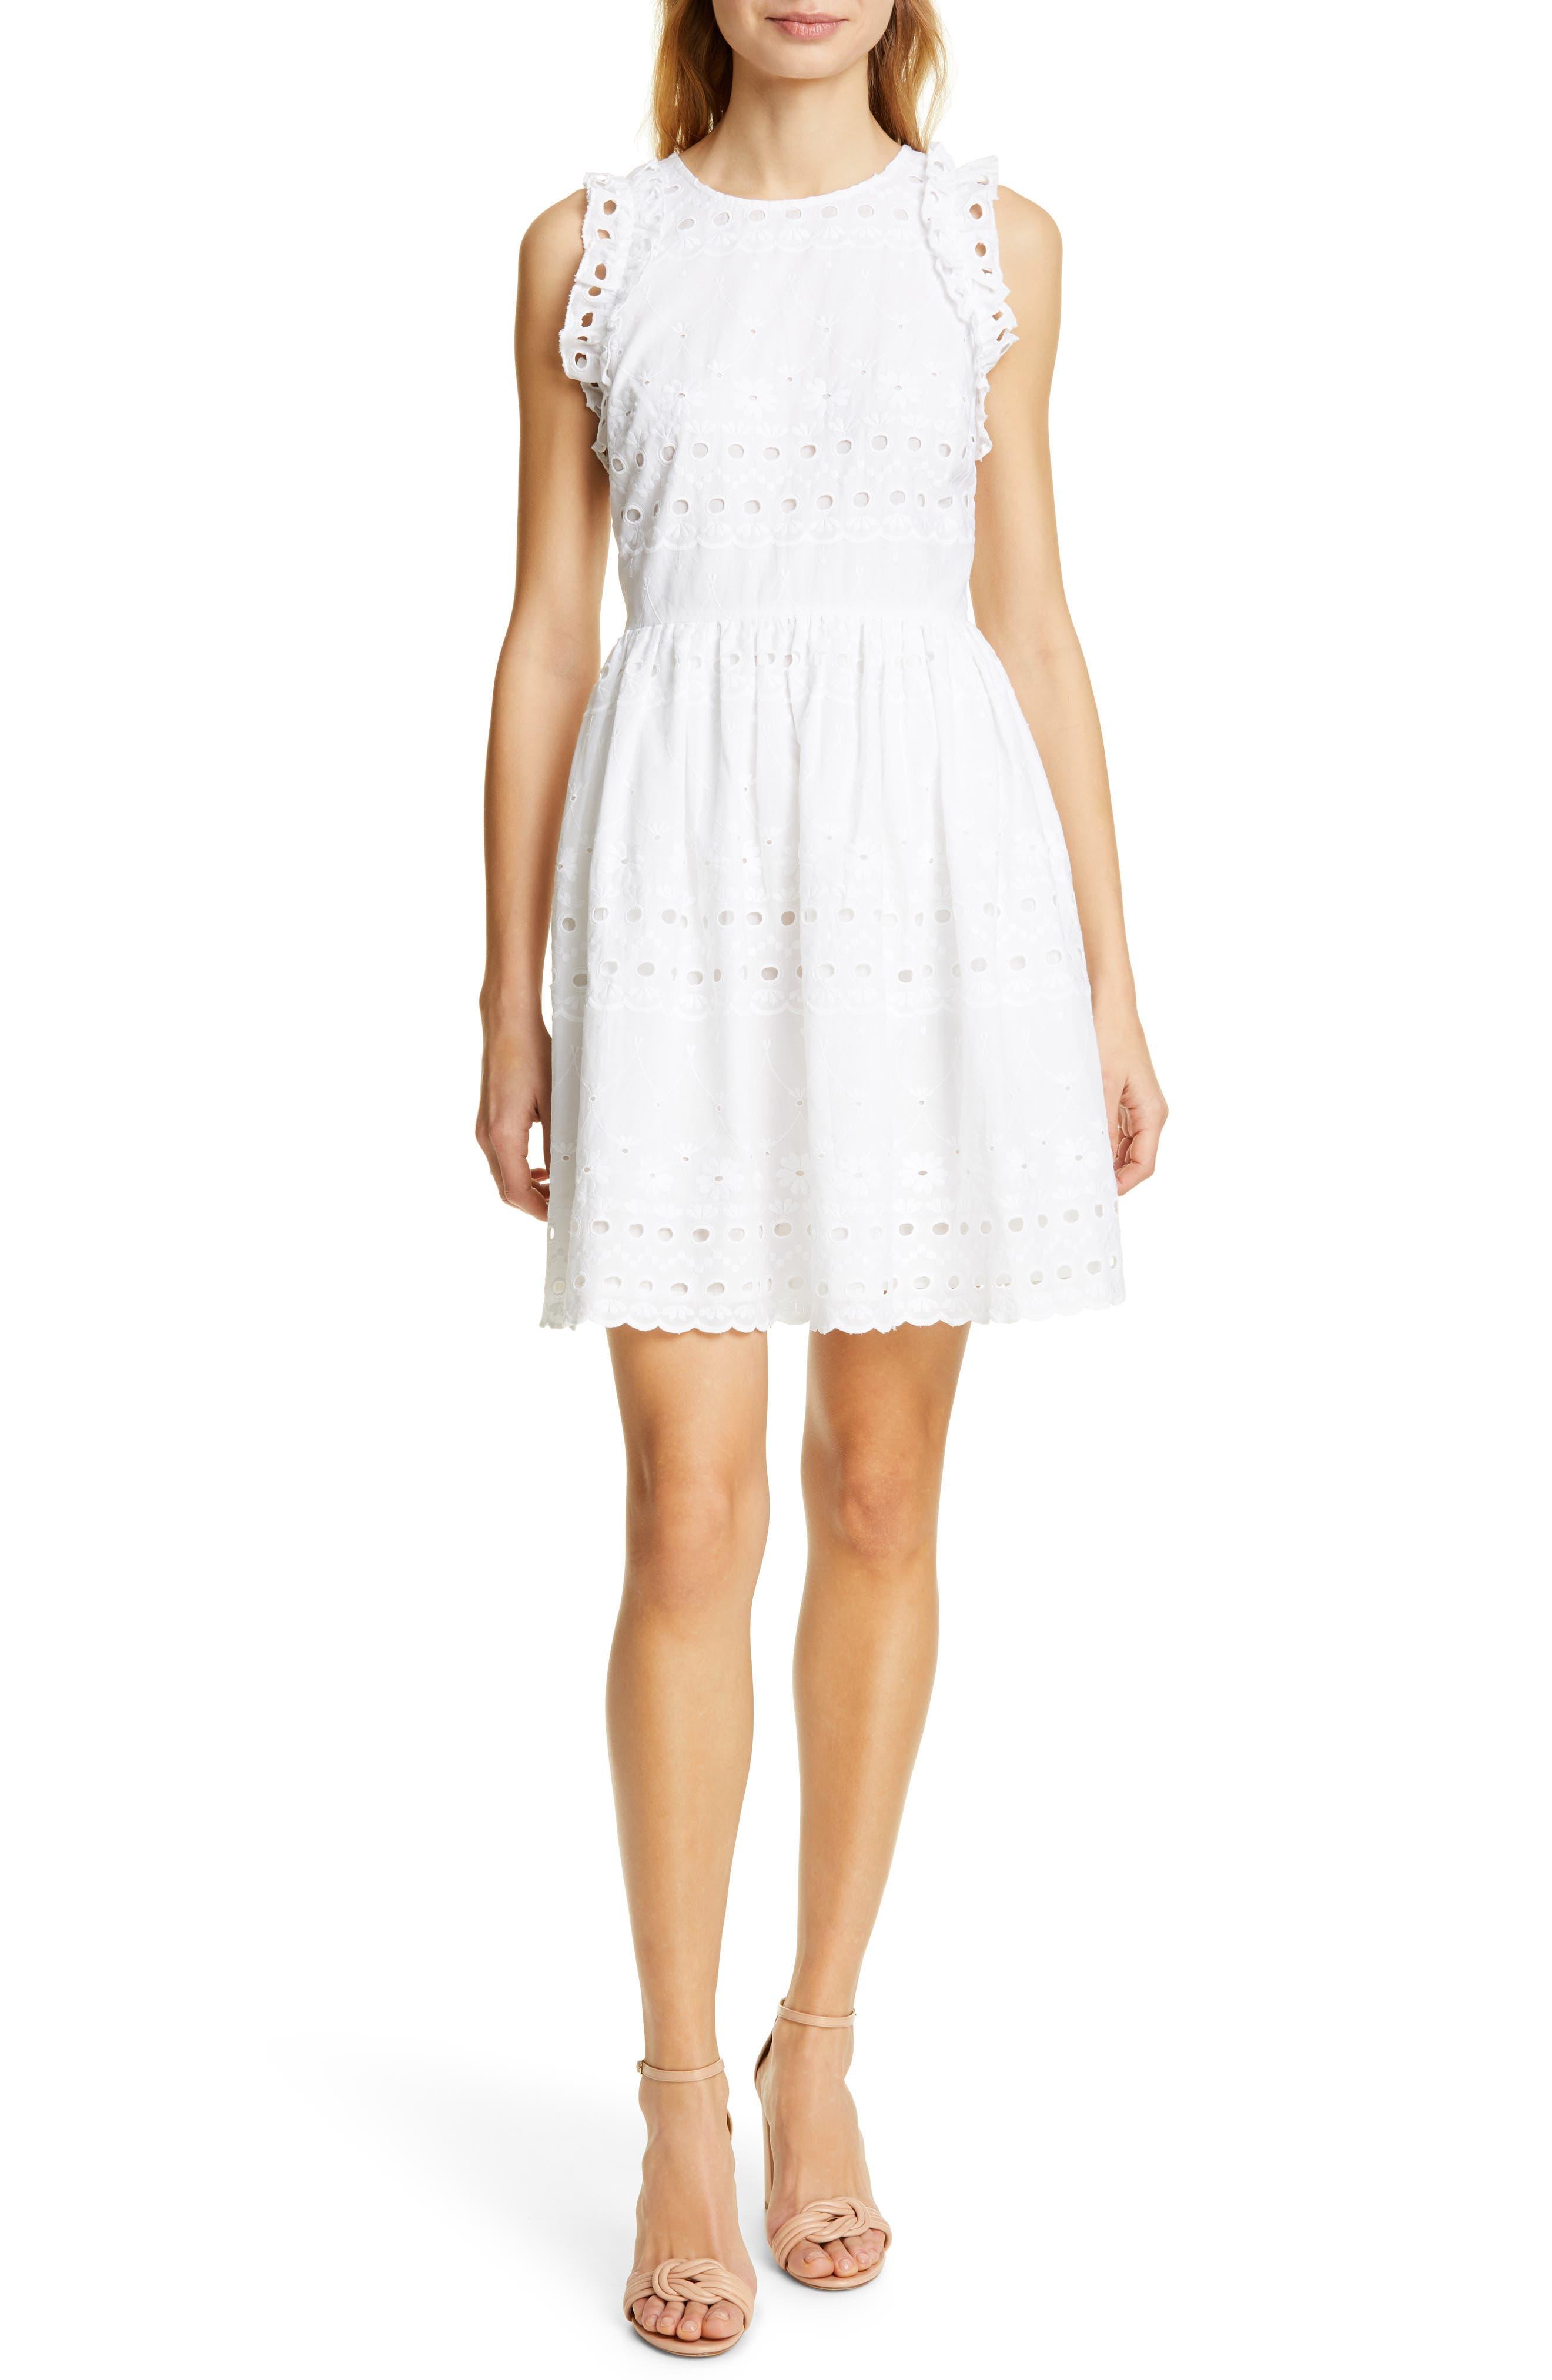 Kate Spade New York Eyelet Fit & Flare Dress, White